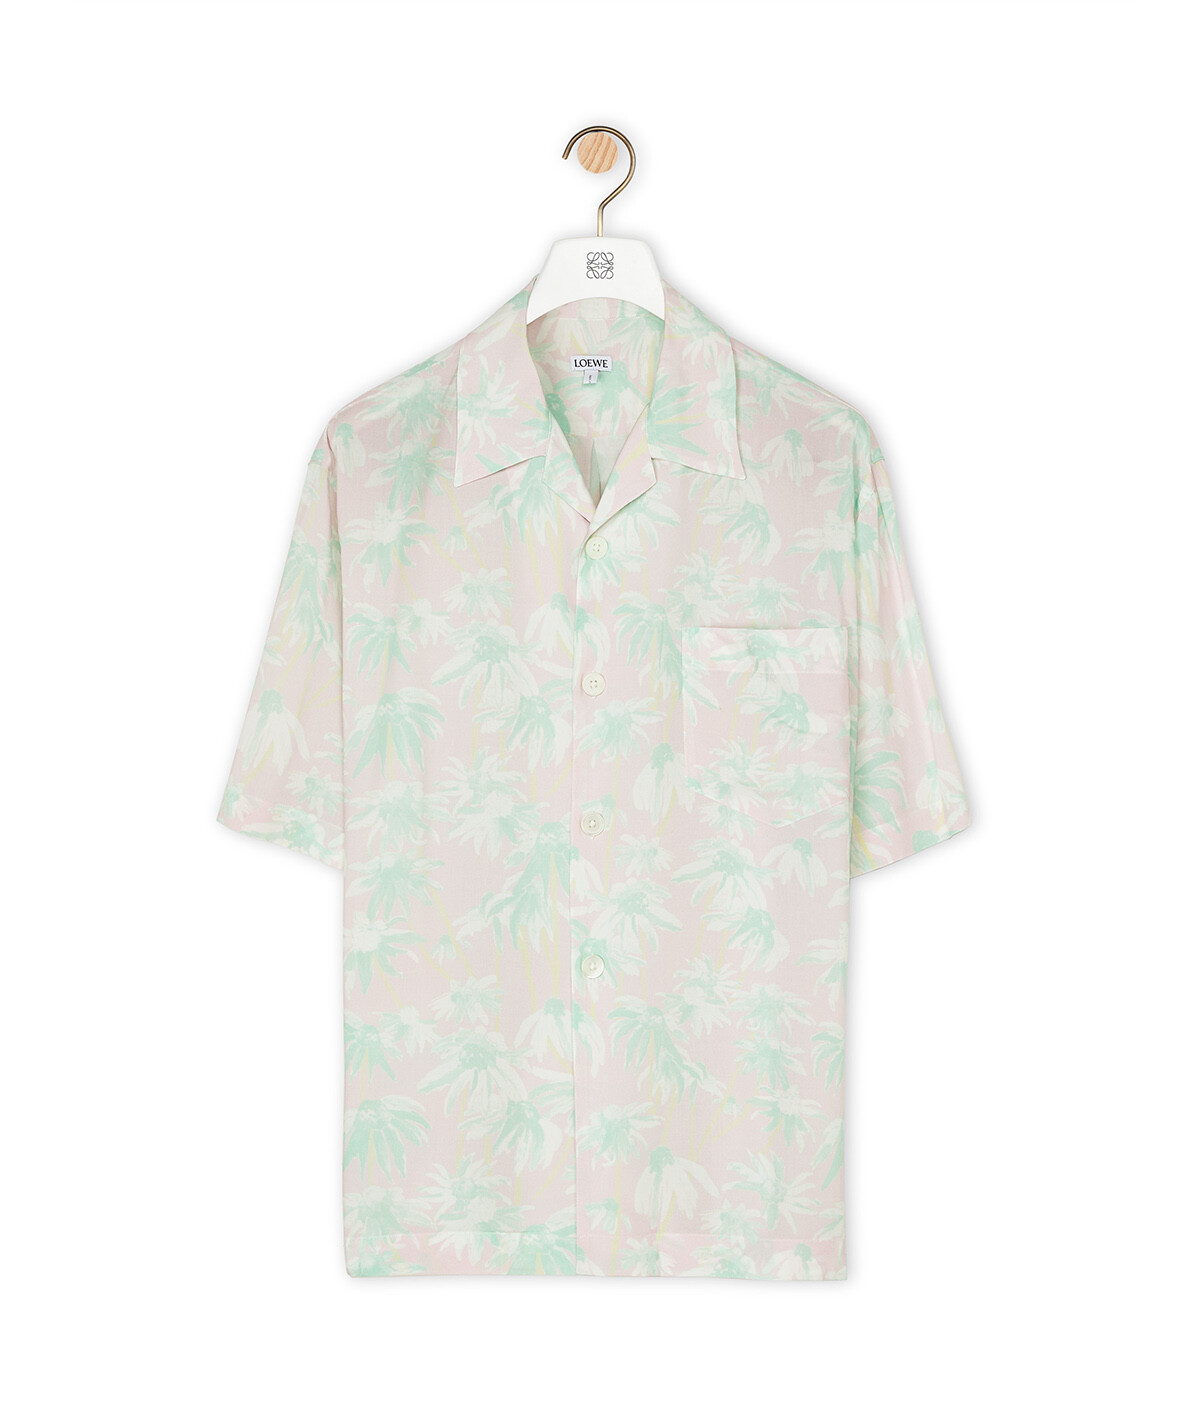 LOEWE Bowling Shirt Rosa/Verde Claro front